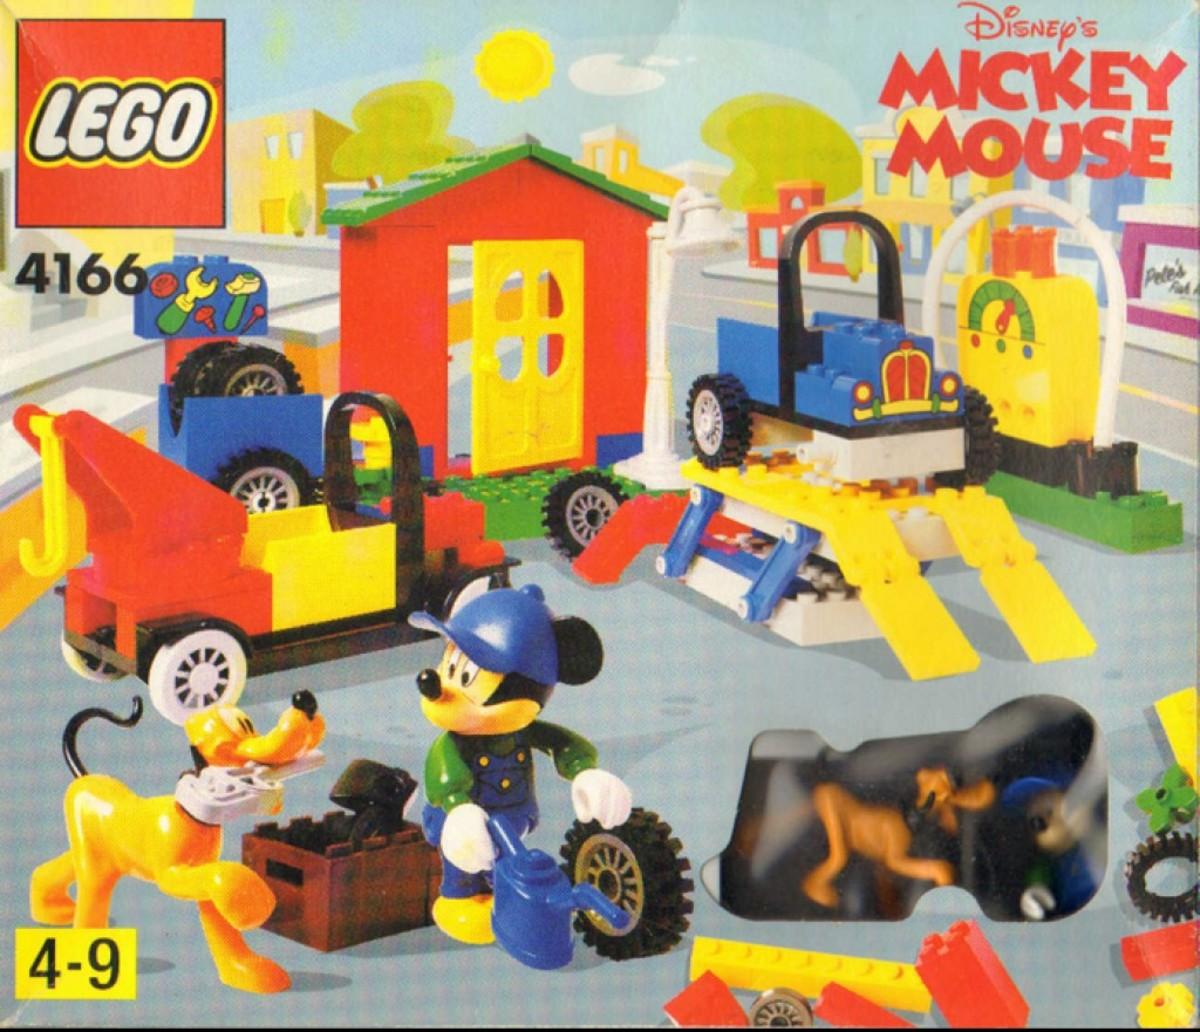 LEGO Mickey Mouse Mickey's Car Garage 4166 Box